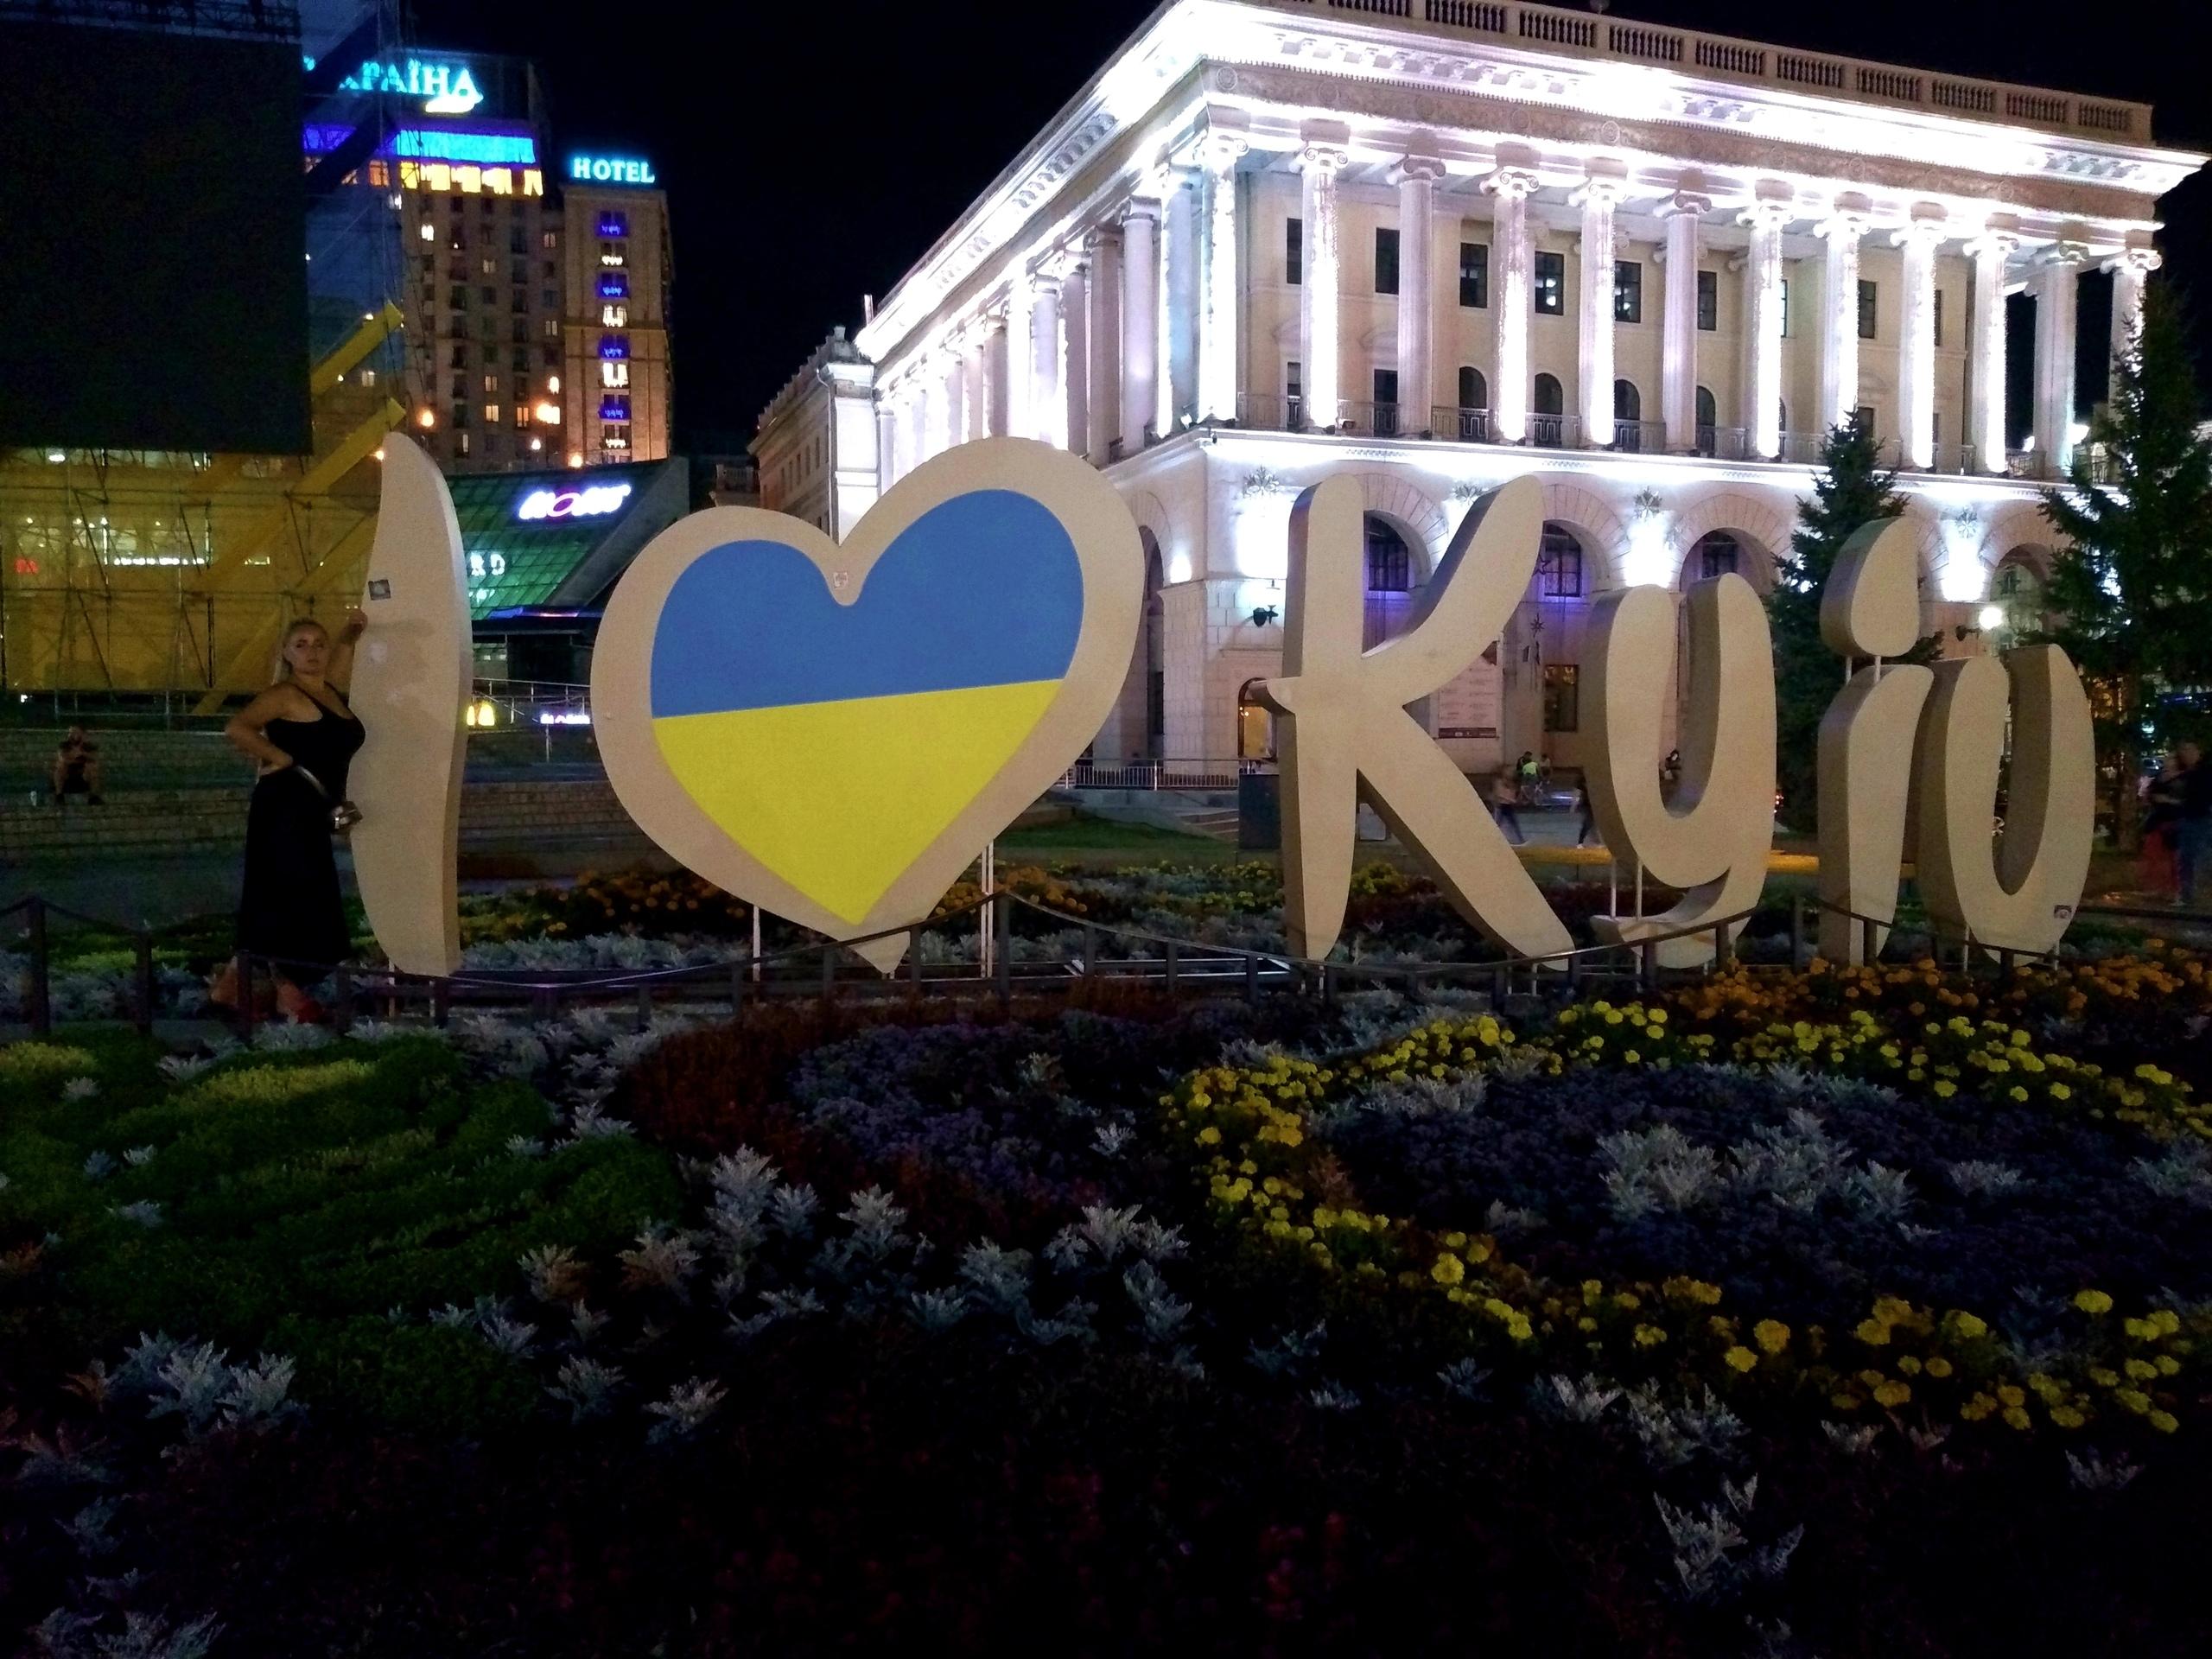 Елена Руденко (Валтея). Украина. Киев. Фото и описание.  - Страница 2 E1HGT5o56Vg